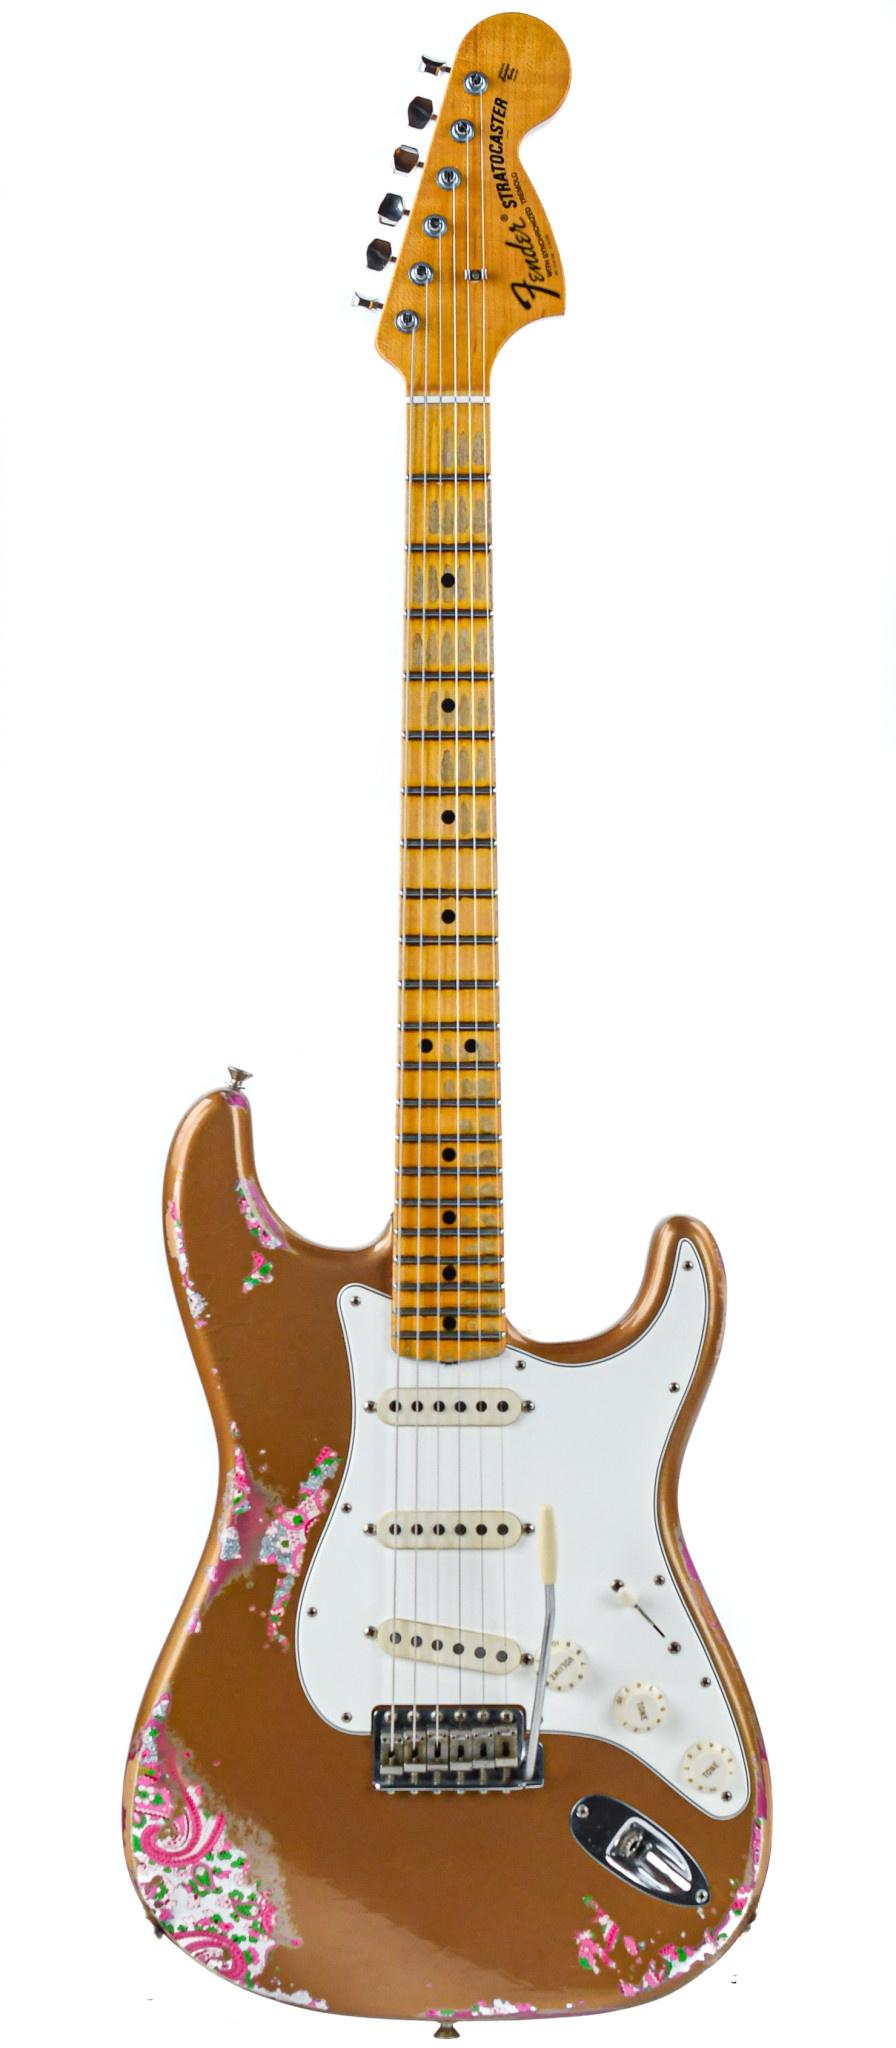 Fender Custom Shop NAMM 69 Stratocaster Gold Over Paisley Relic 2017